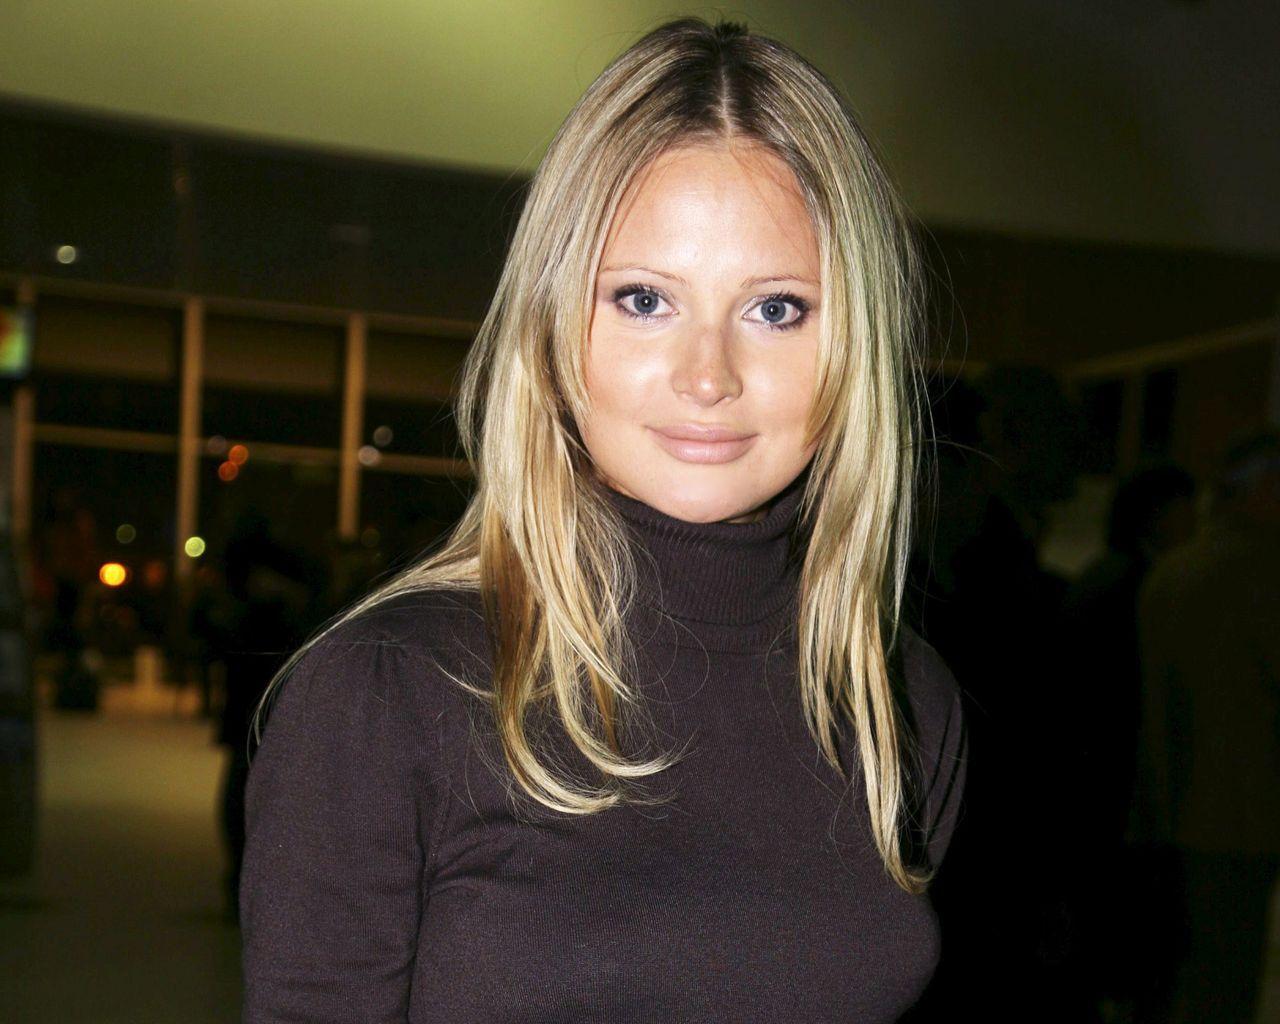 Дана Борисова отказалась от свадьбы?